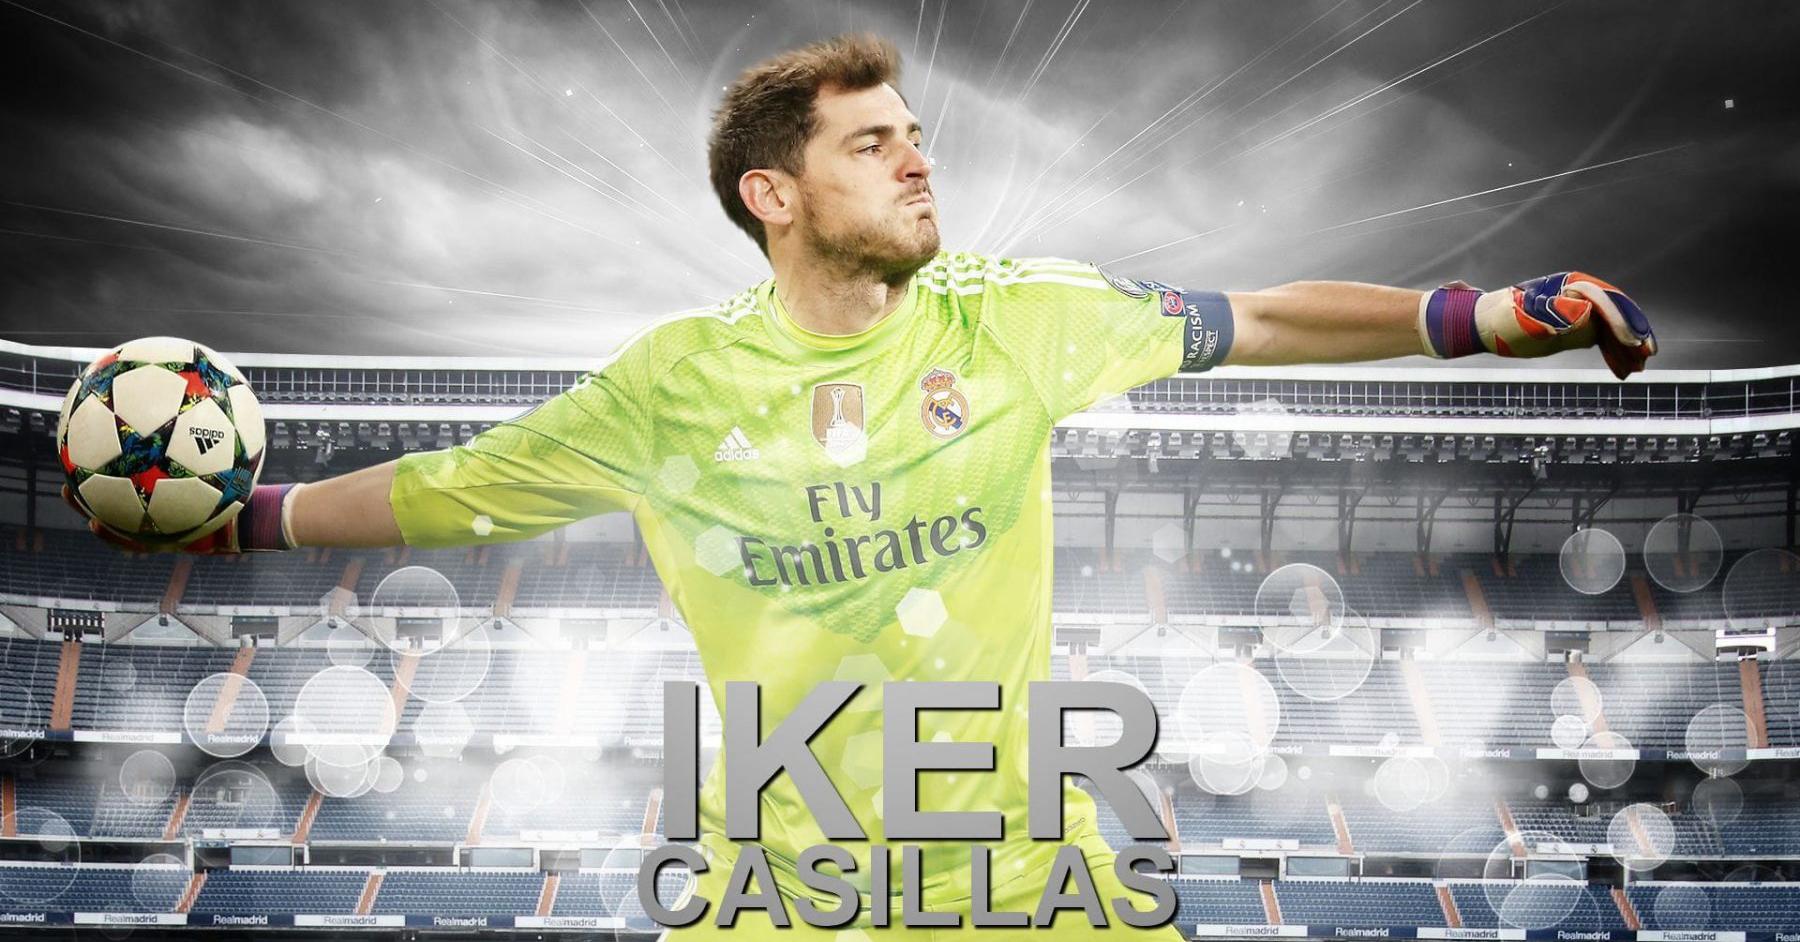 Iker Casillas Biography | Family | Career | Net Worth - Sportslibro.com